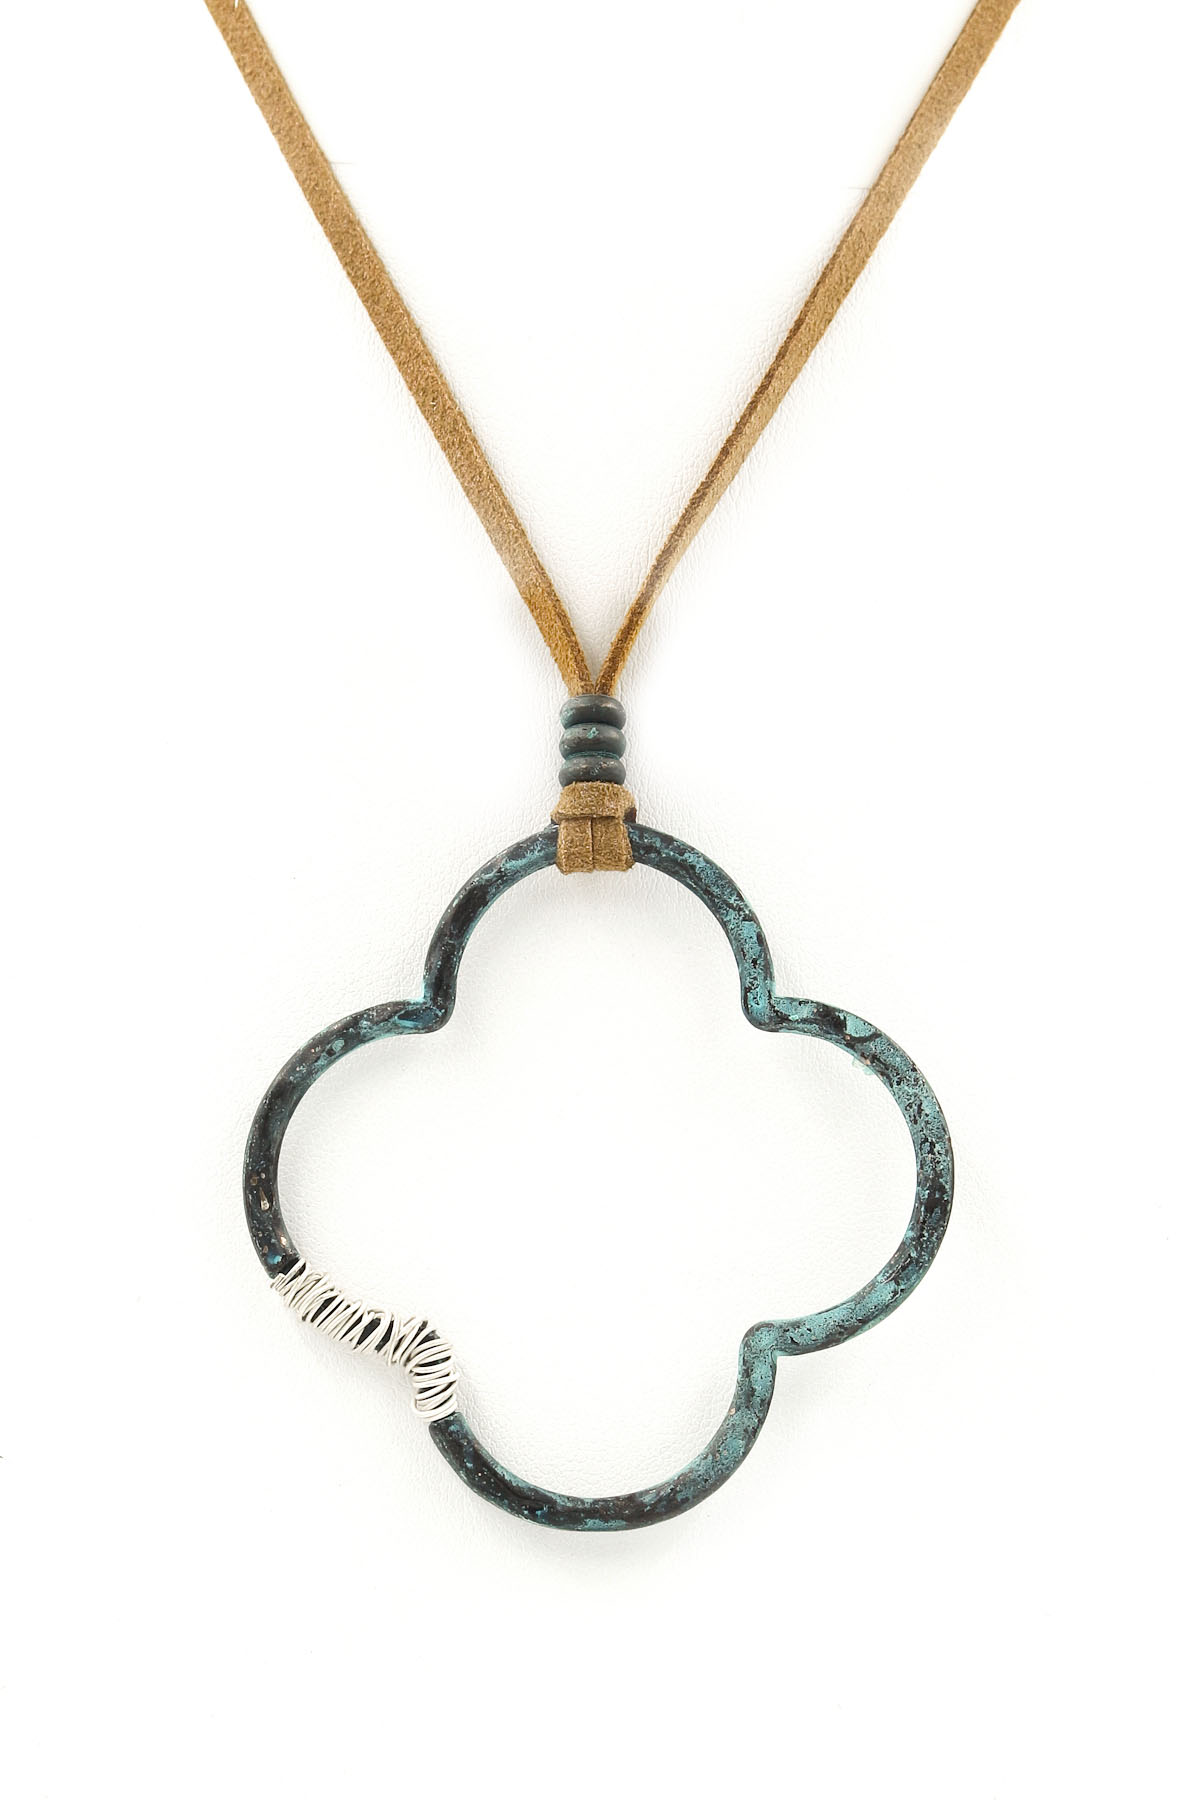 Quatrefoil Pendant Pull Tie Necklace